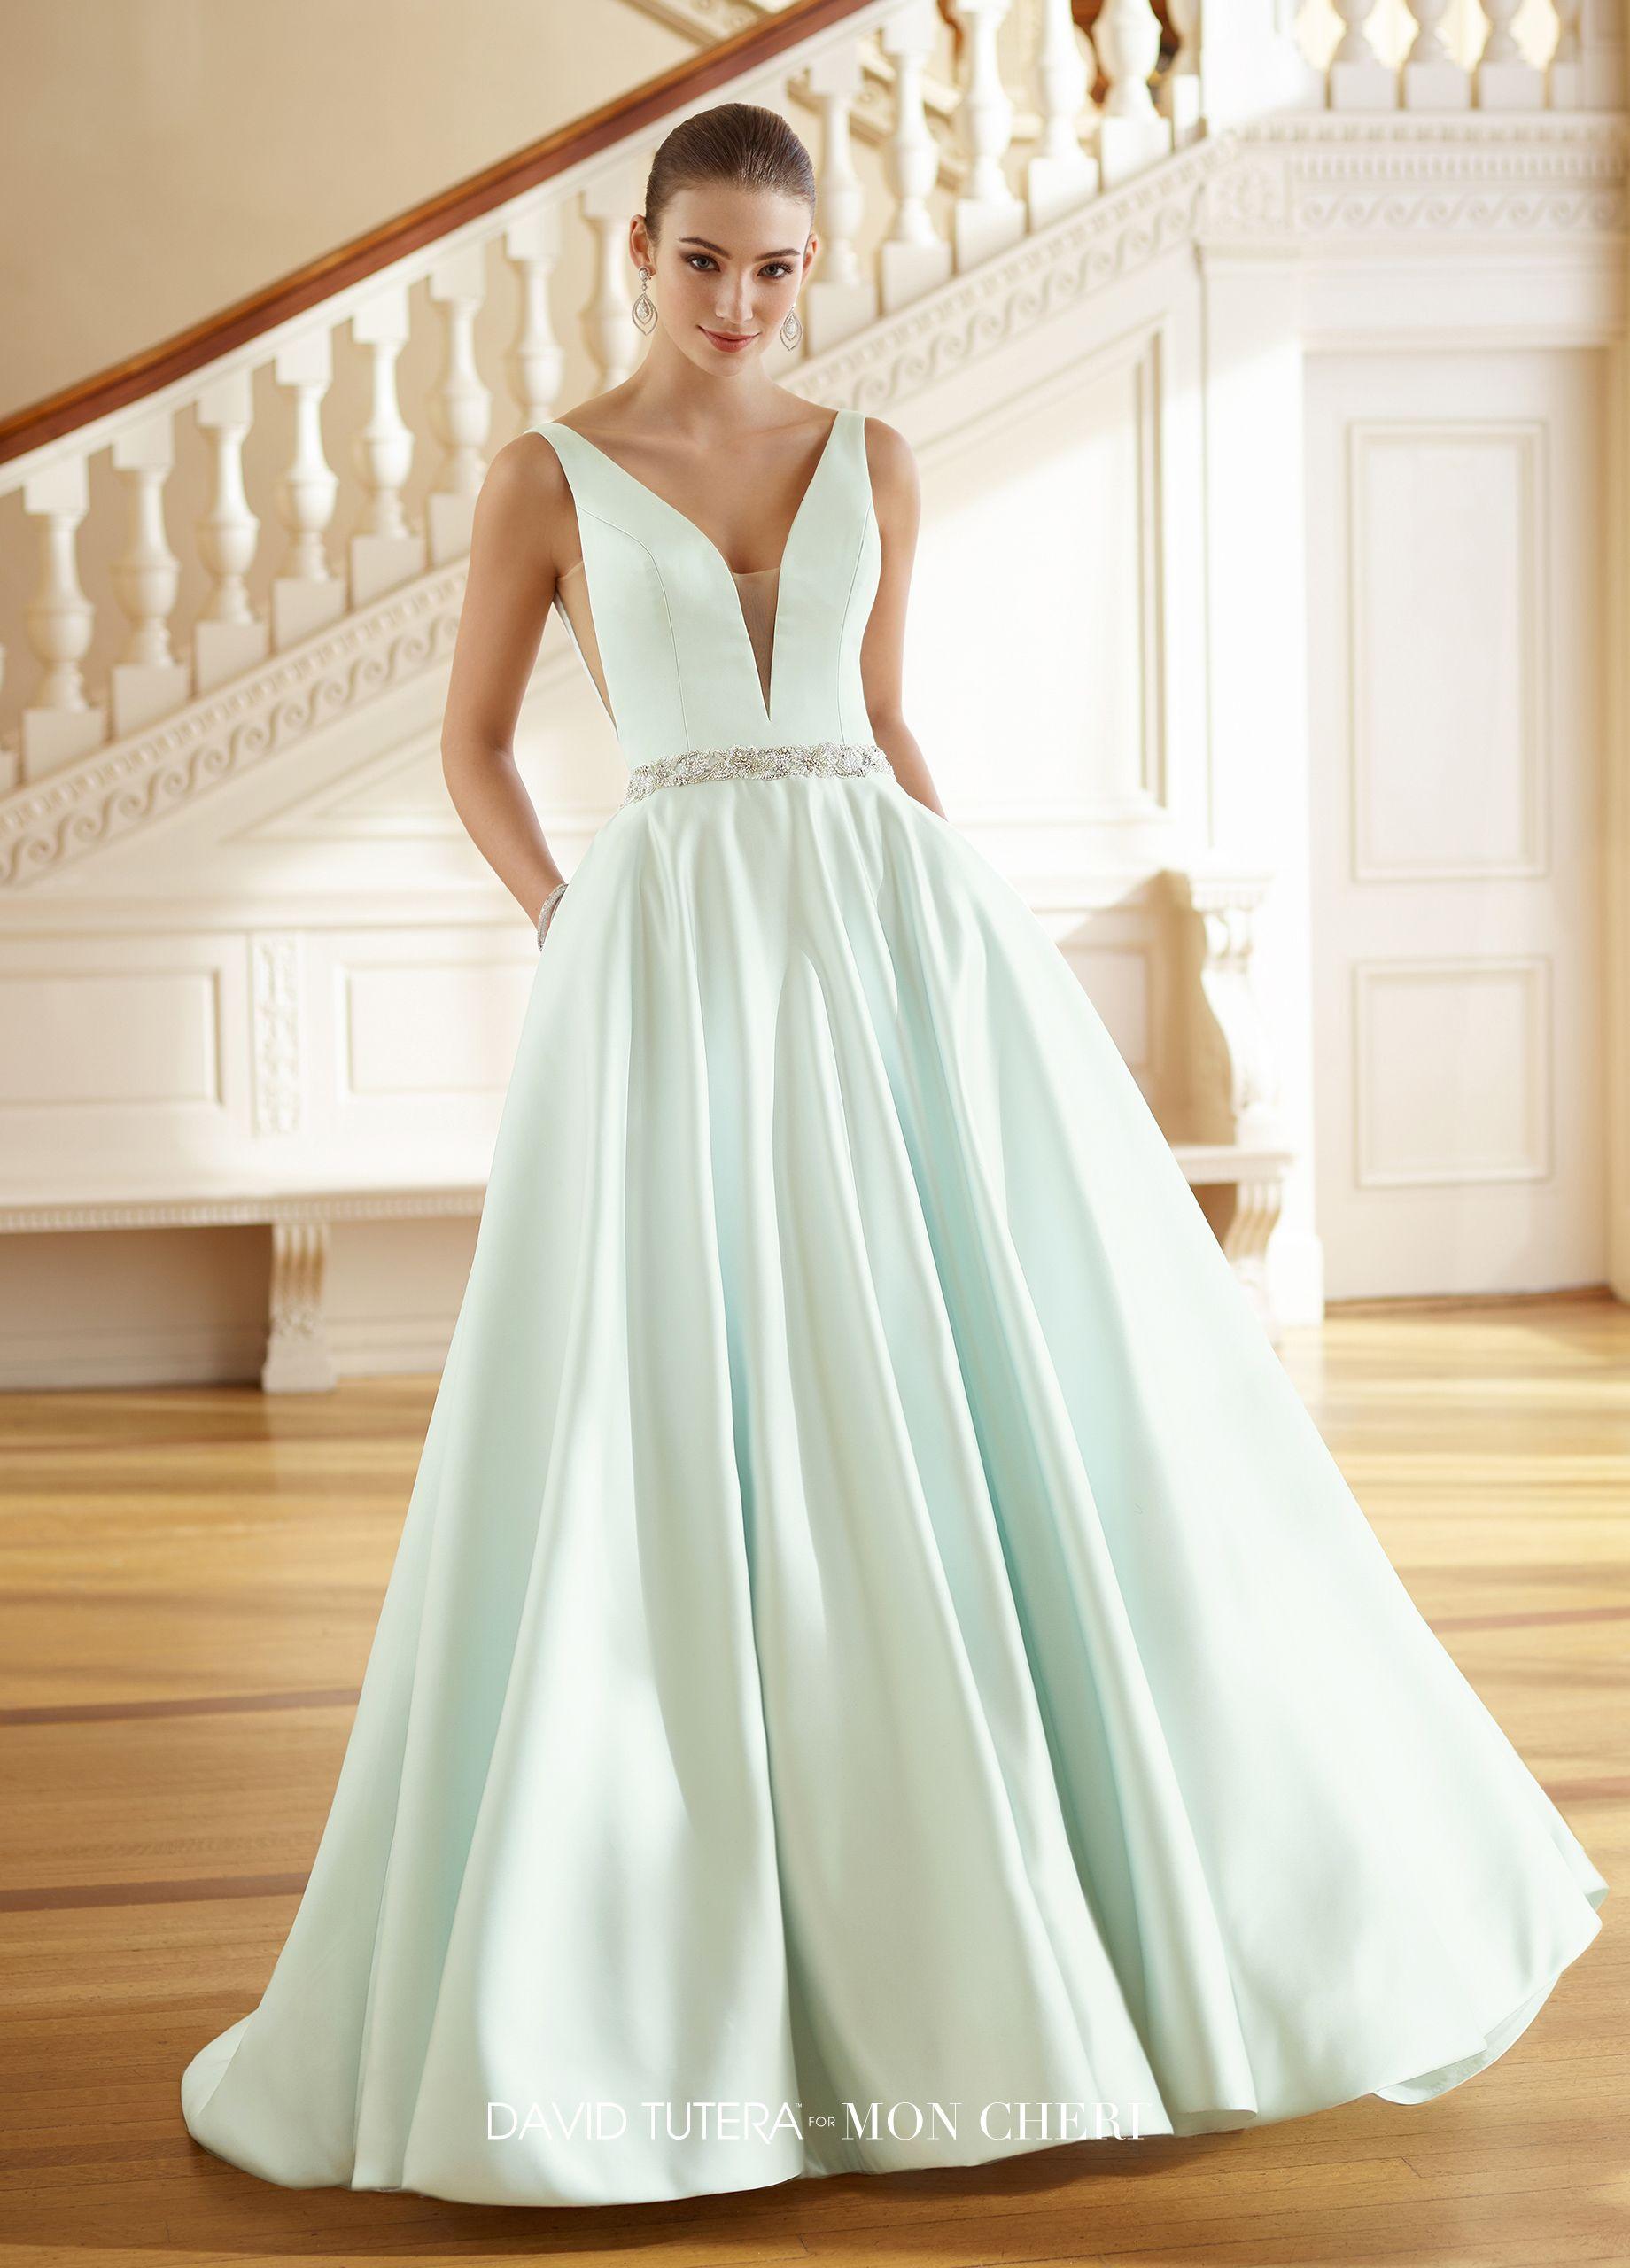 V-Neck Satin A-line Wedding Dress with Pockets & A Belt- 217215 ...